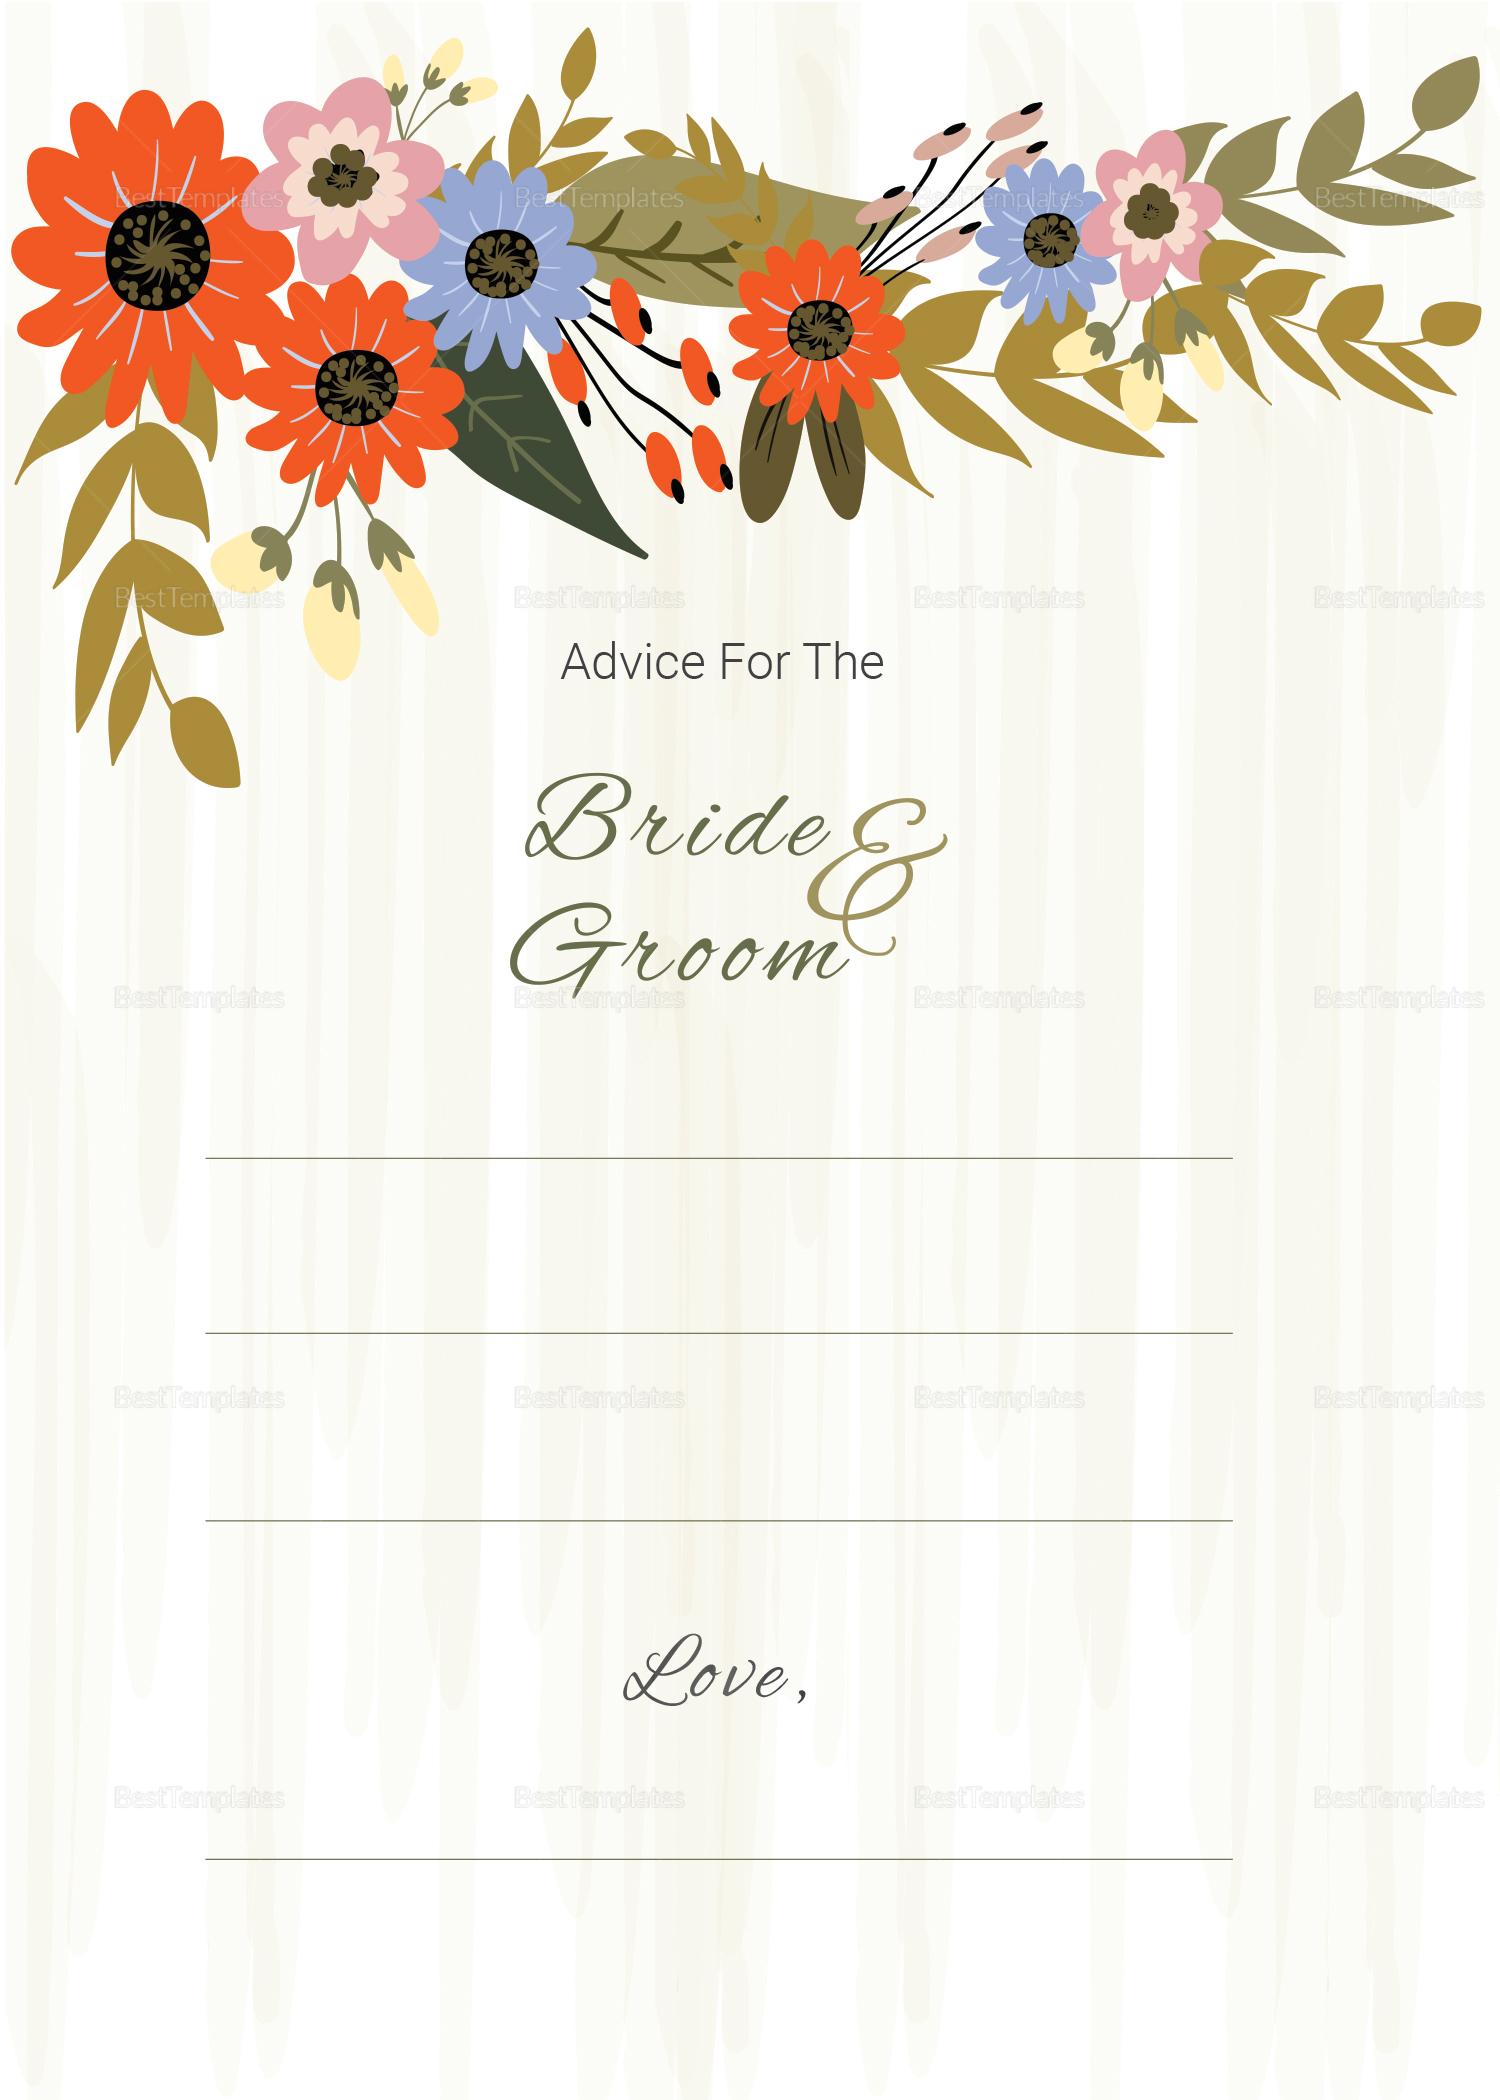 Summer Floral Wedding Advice Card Design Template